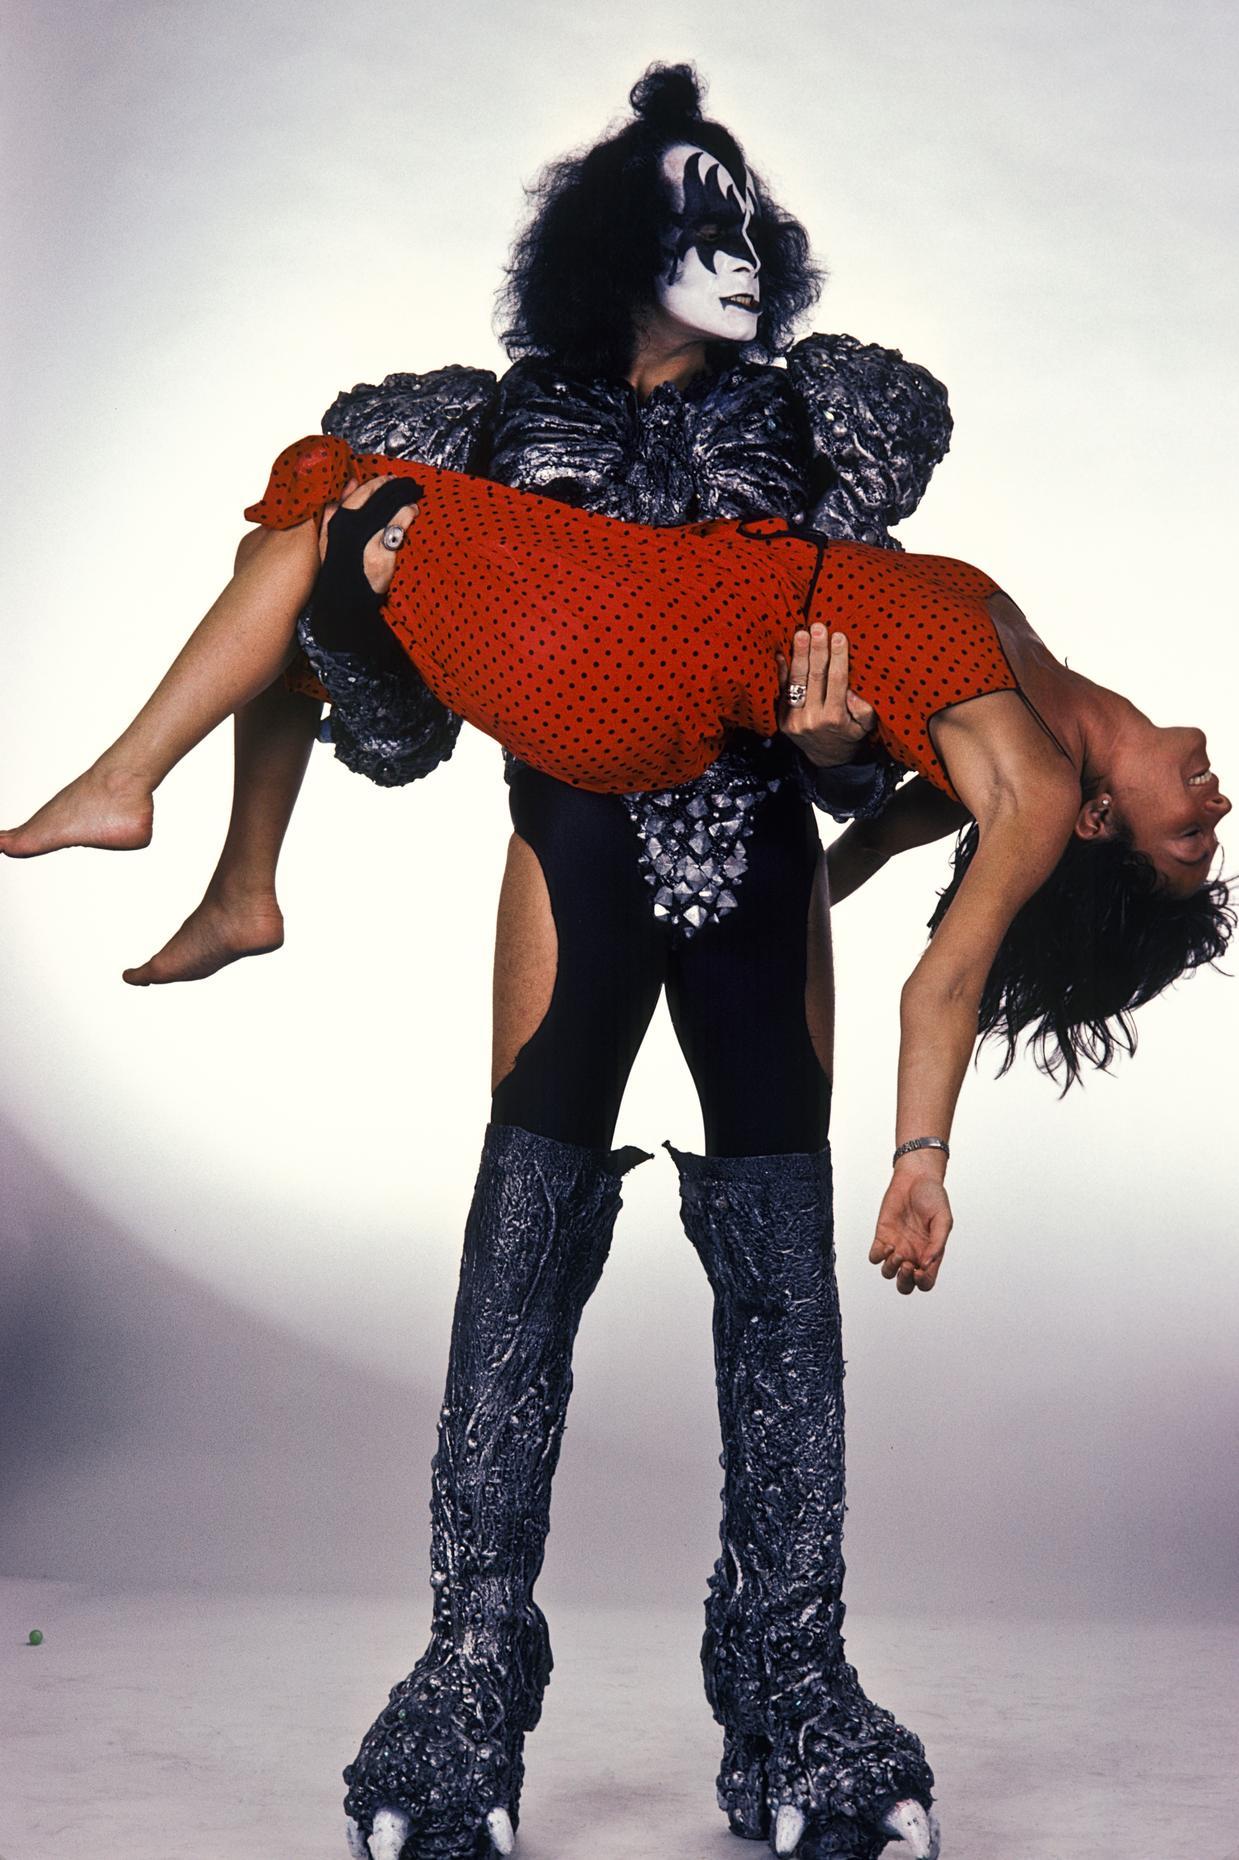 Lynn Goldsmith with Gene Simmons of Kiss.